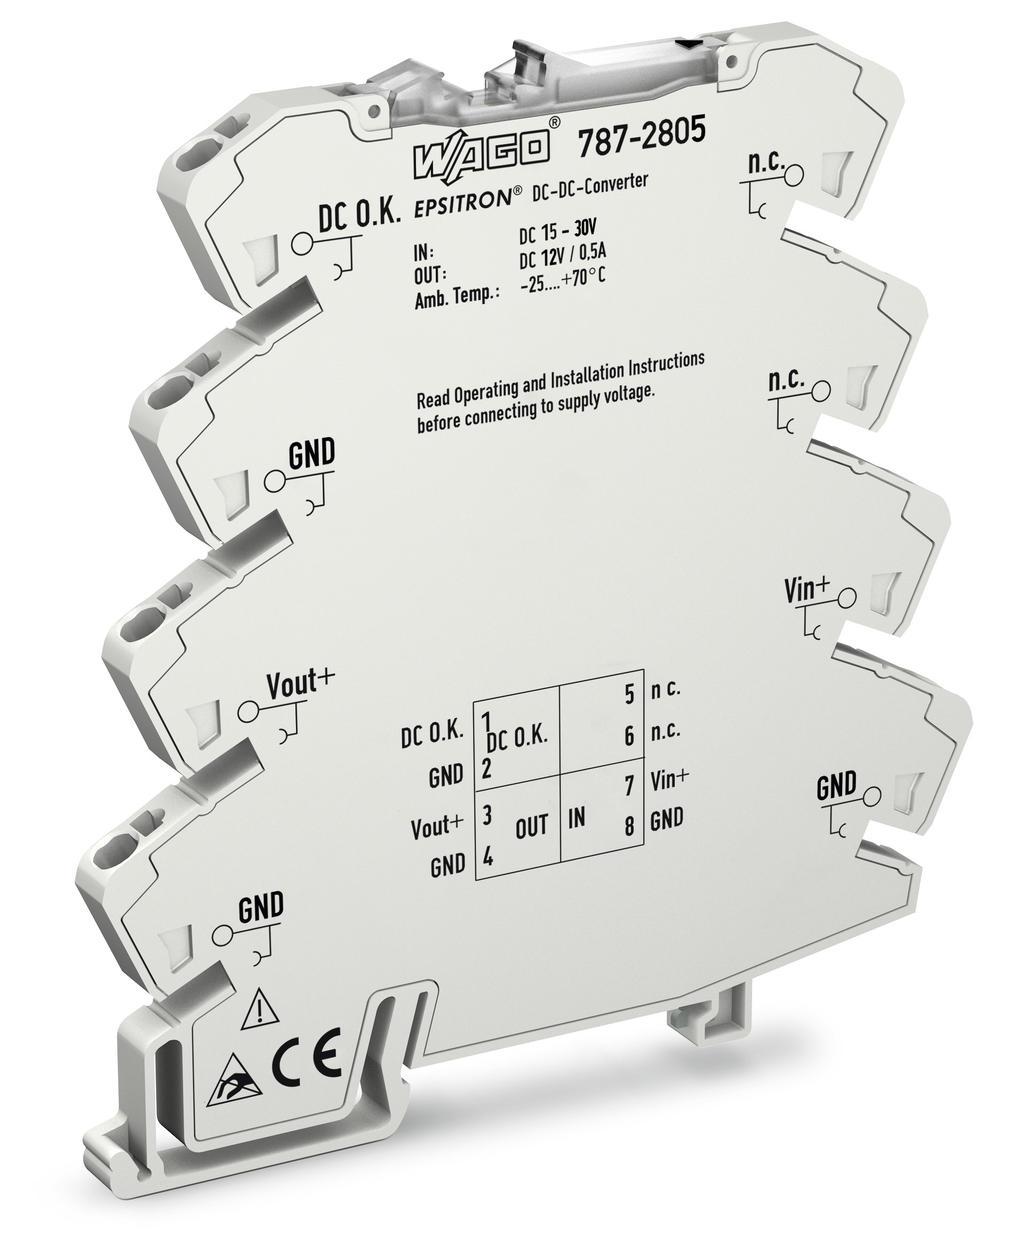 Wago Dc Converter 787 2805 0 30v Power Supply Circuit Diagram Input Voltage 24 Vdc Output 12 05 A